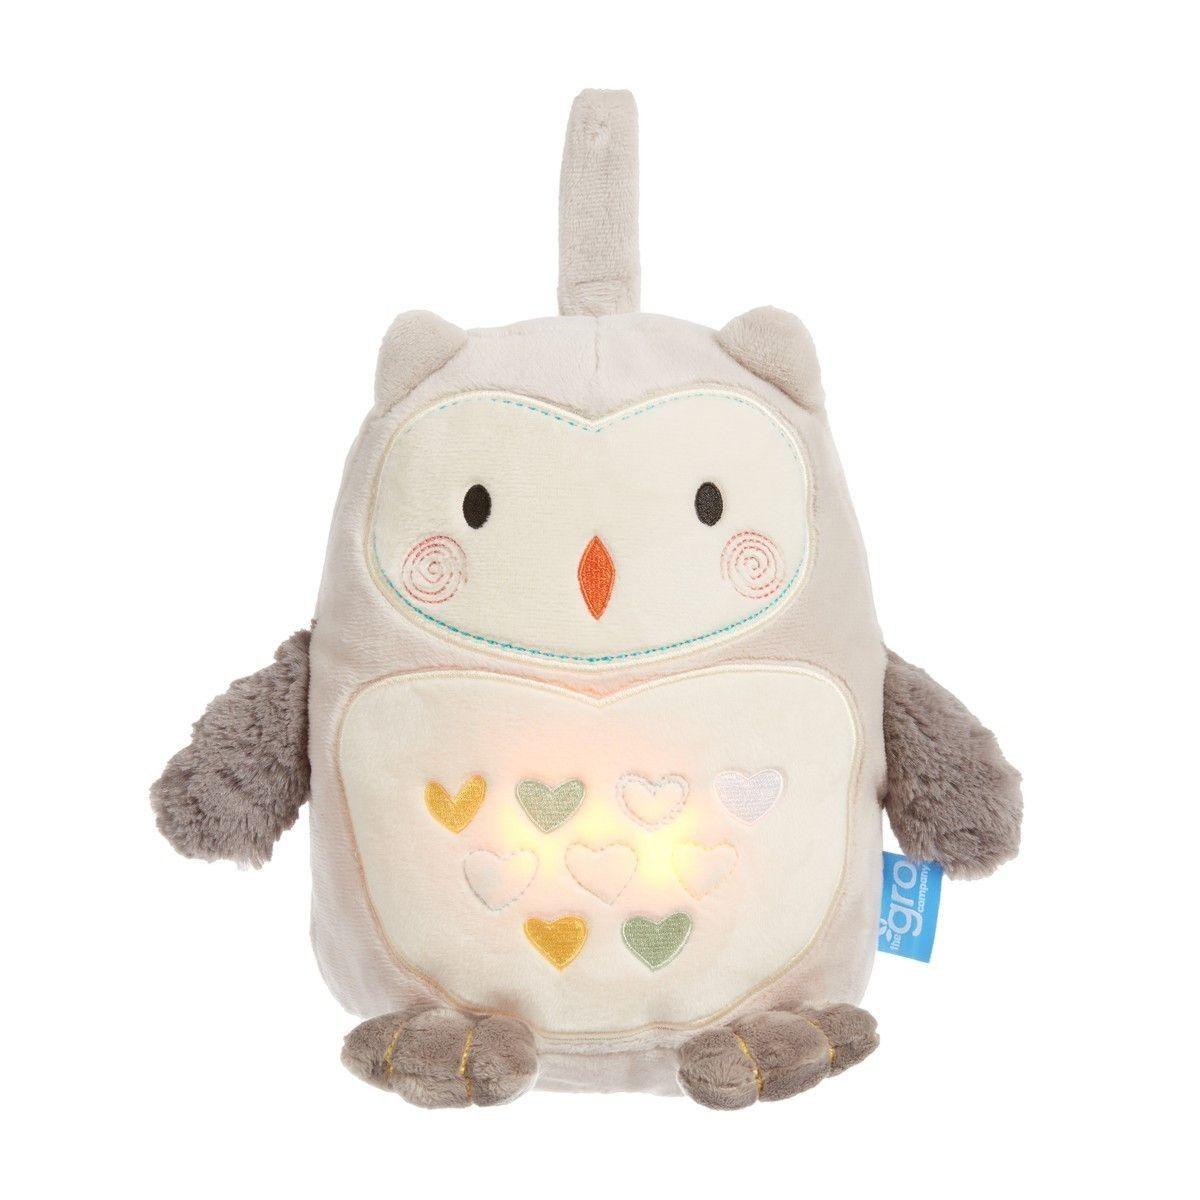 Peluche aide au sommeil Ollie the Owl